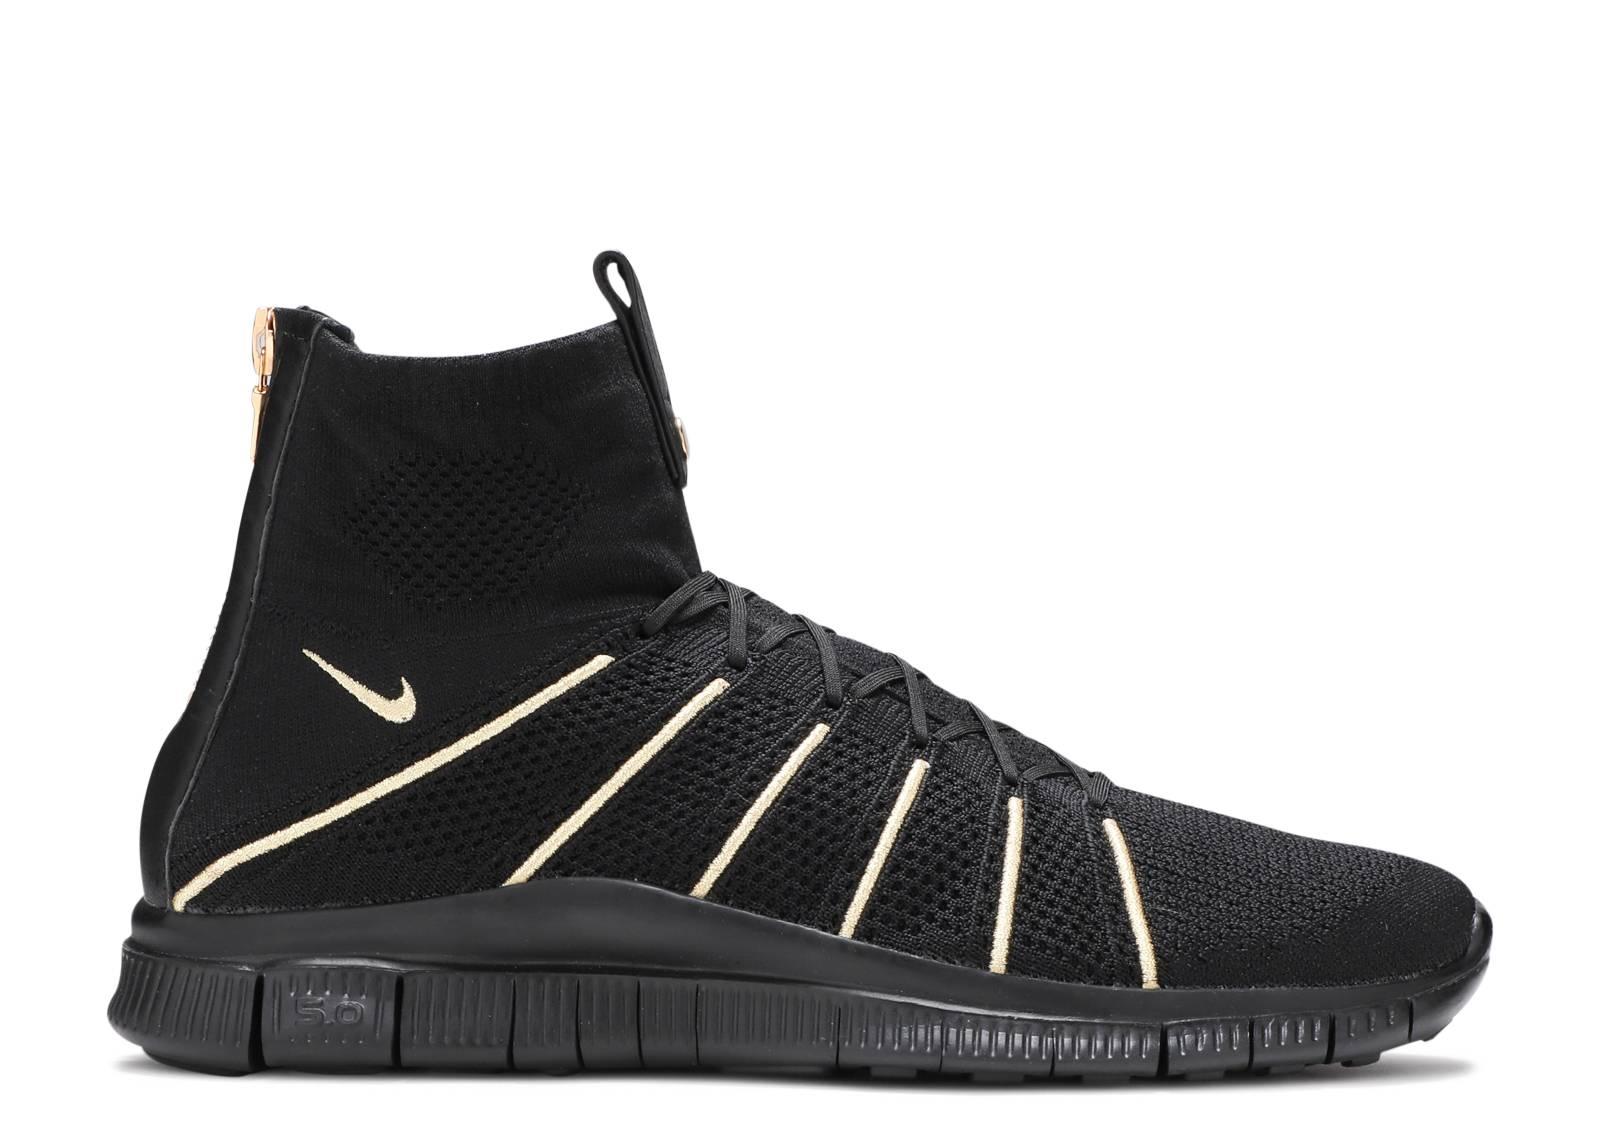 Nike Free Mercurial Flyknit X Olivier Rousteing Nikelab 43eu 95us